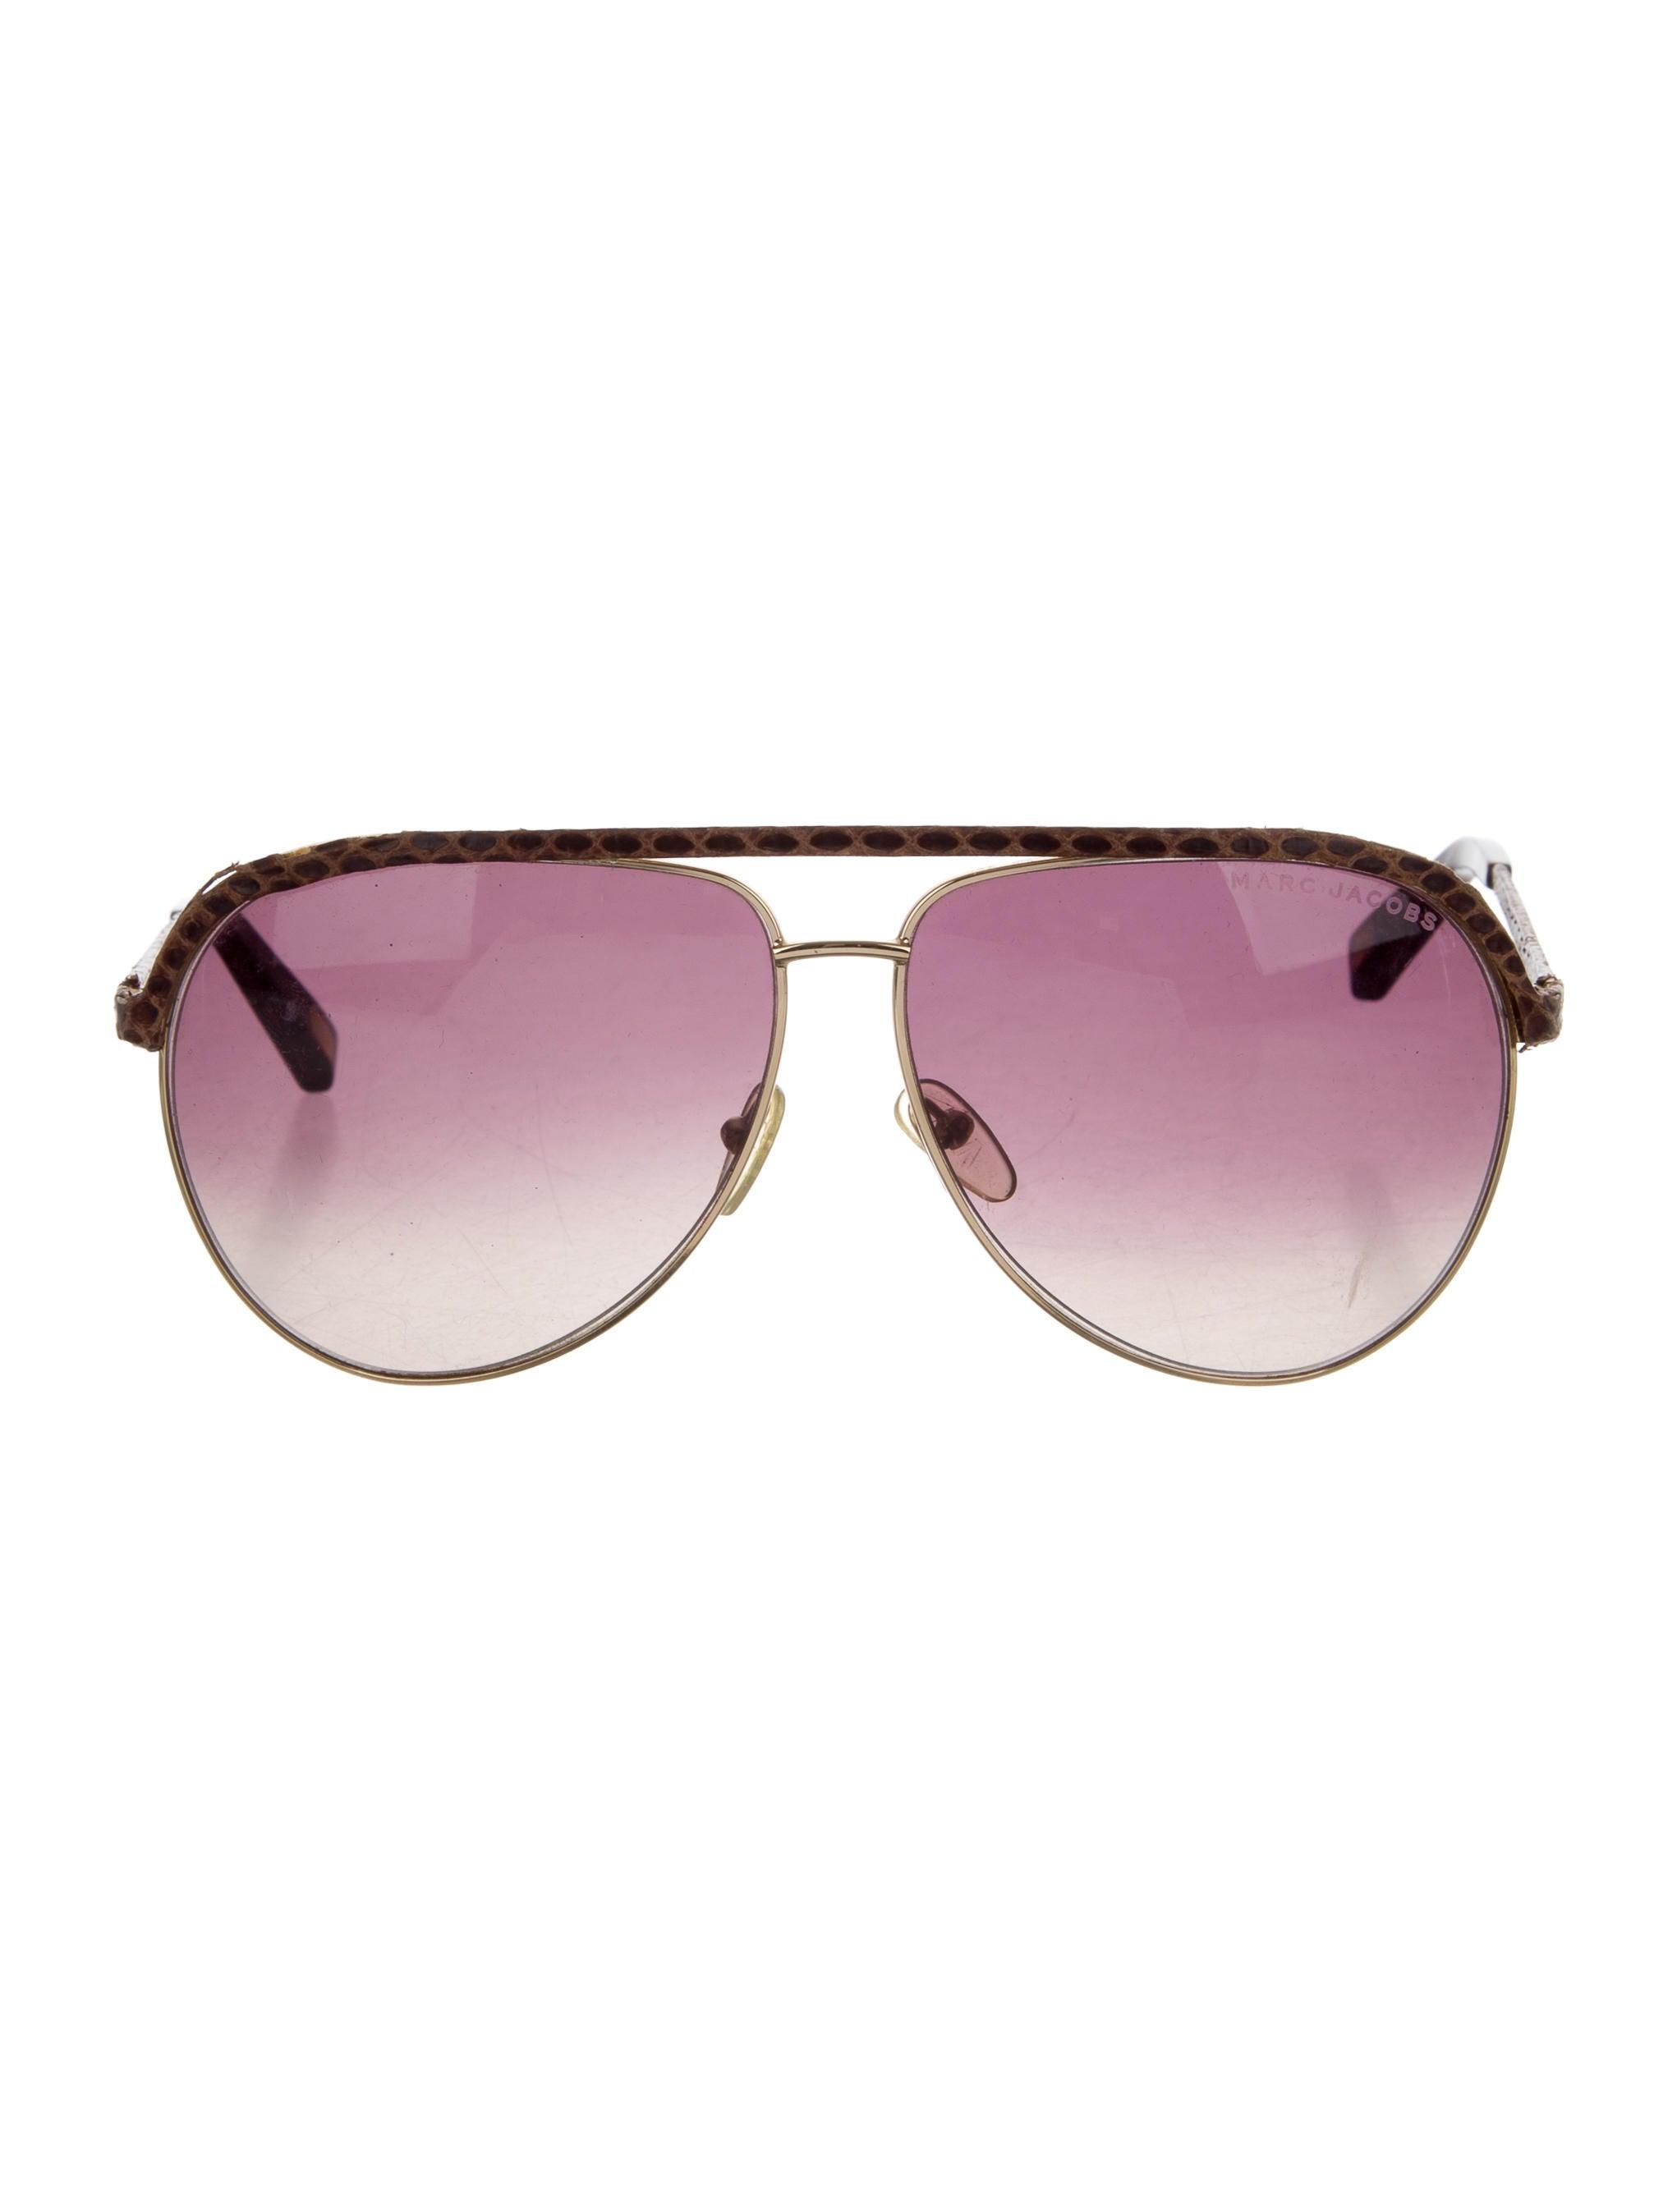 9e8163b091 Marc Jacobs Oversize Aviator Sunglasses - Accessories - MAR51462 ...